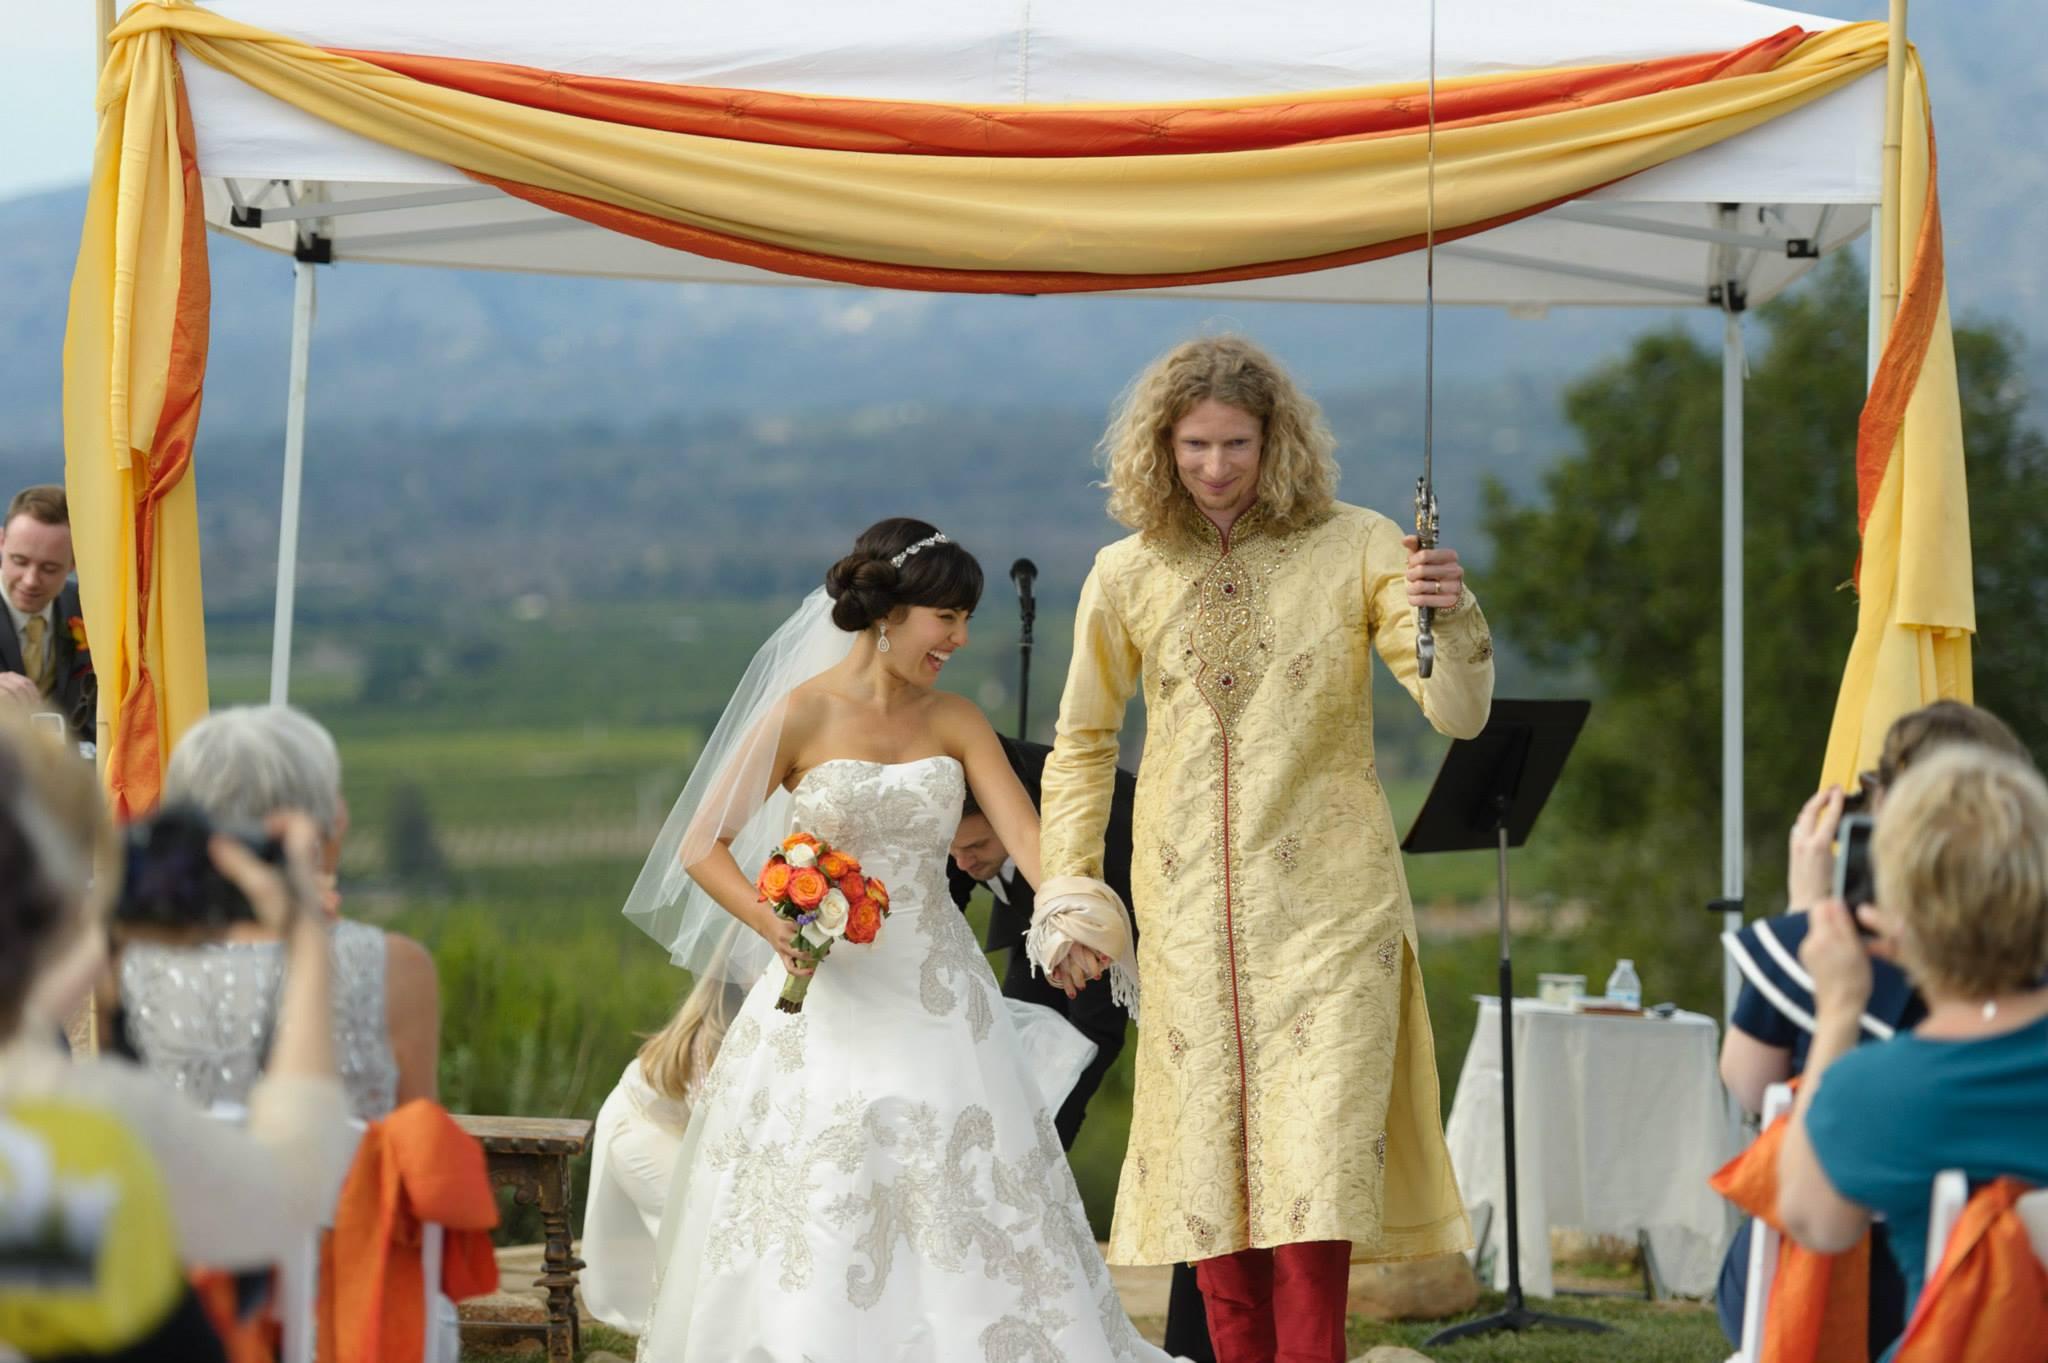 asher and lyric wedding